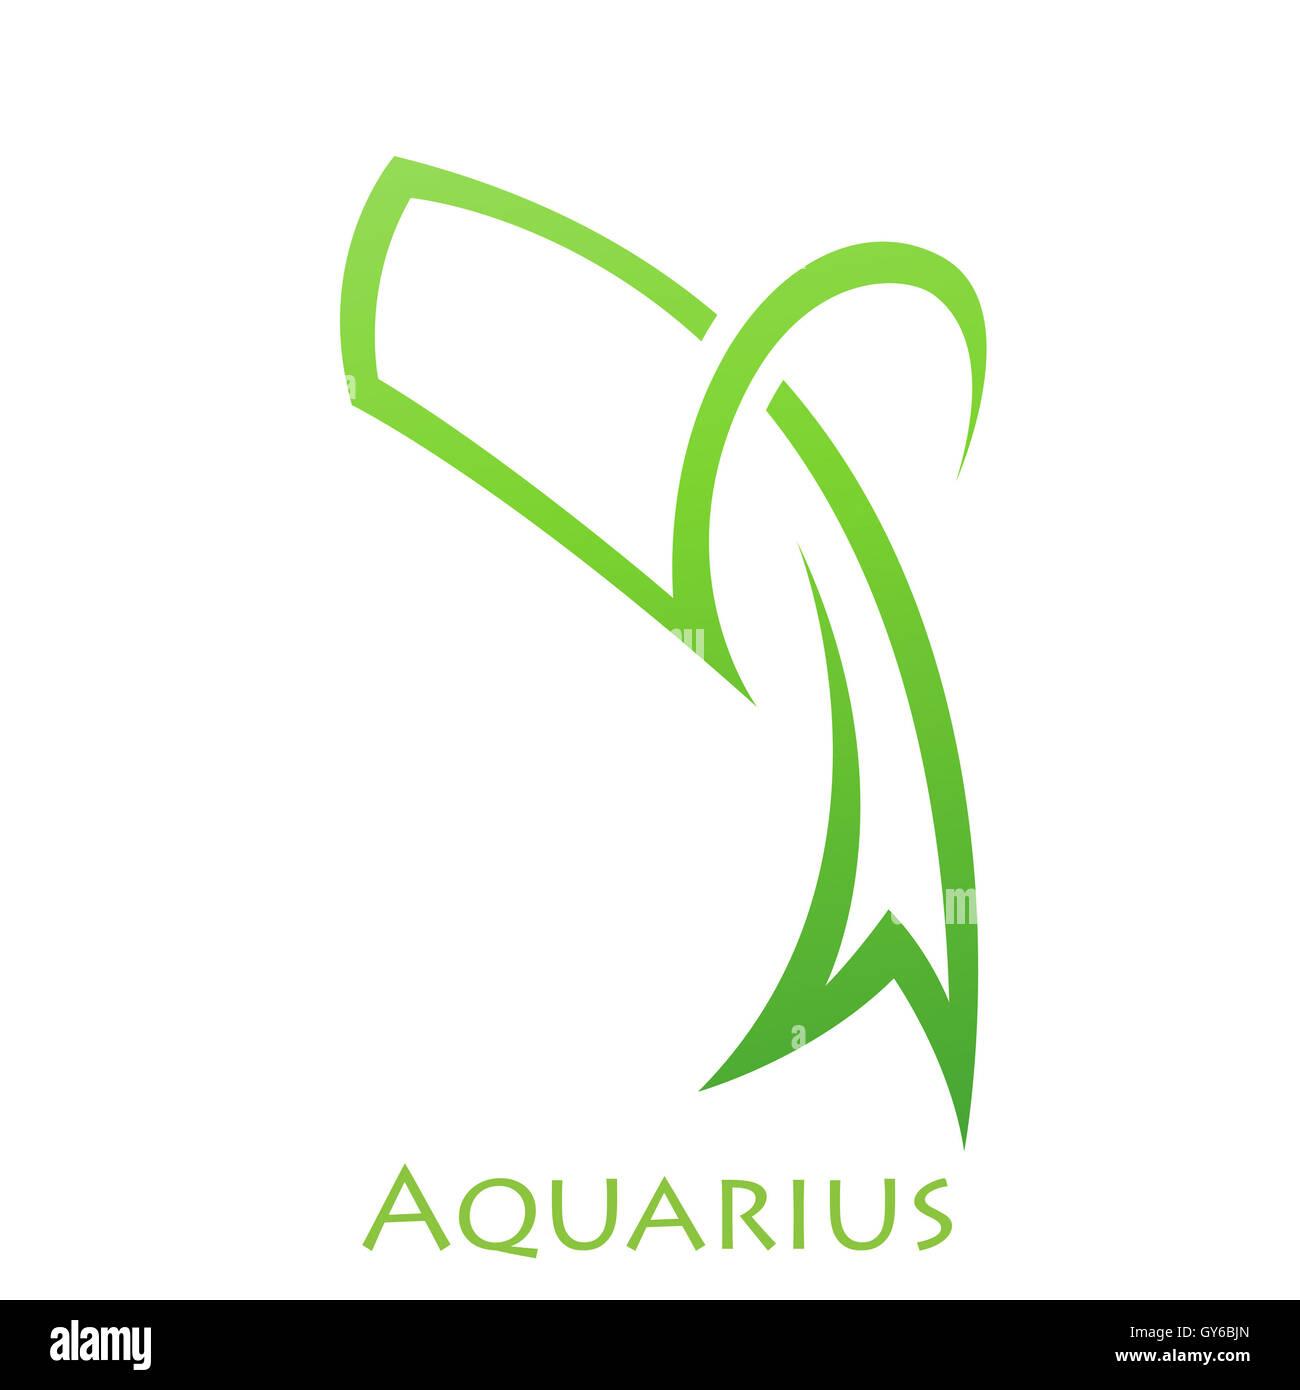 Aquarius Symbol Zodiac Sign Illustration Horoscope Stock Photos